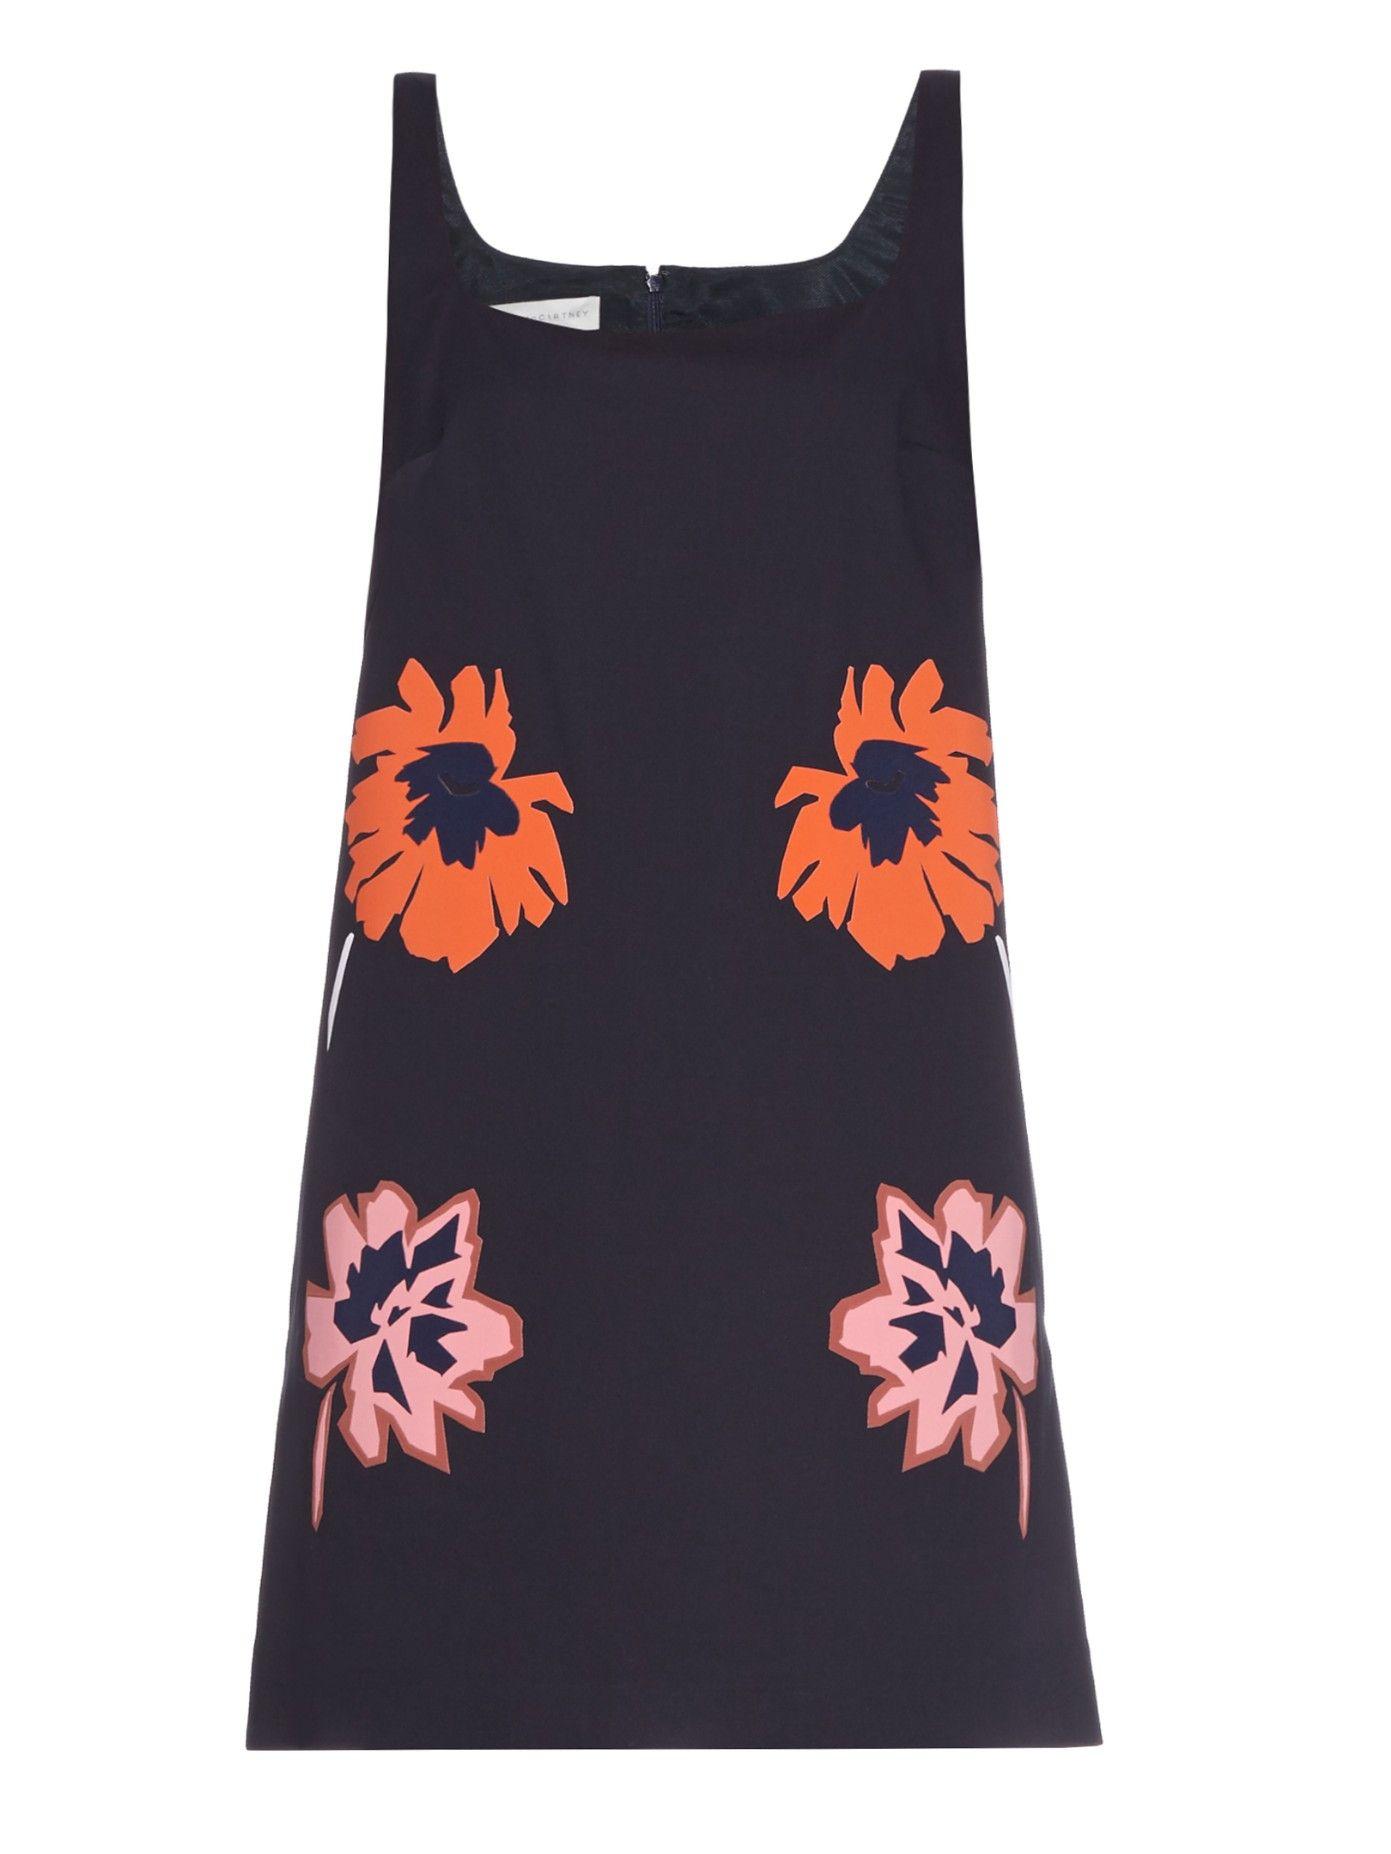 Melissa flower-appliqué mini dress by Stella McCartney | Shop now at #MATCHESFASHION.COM